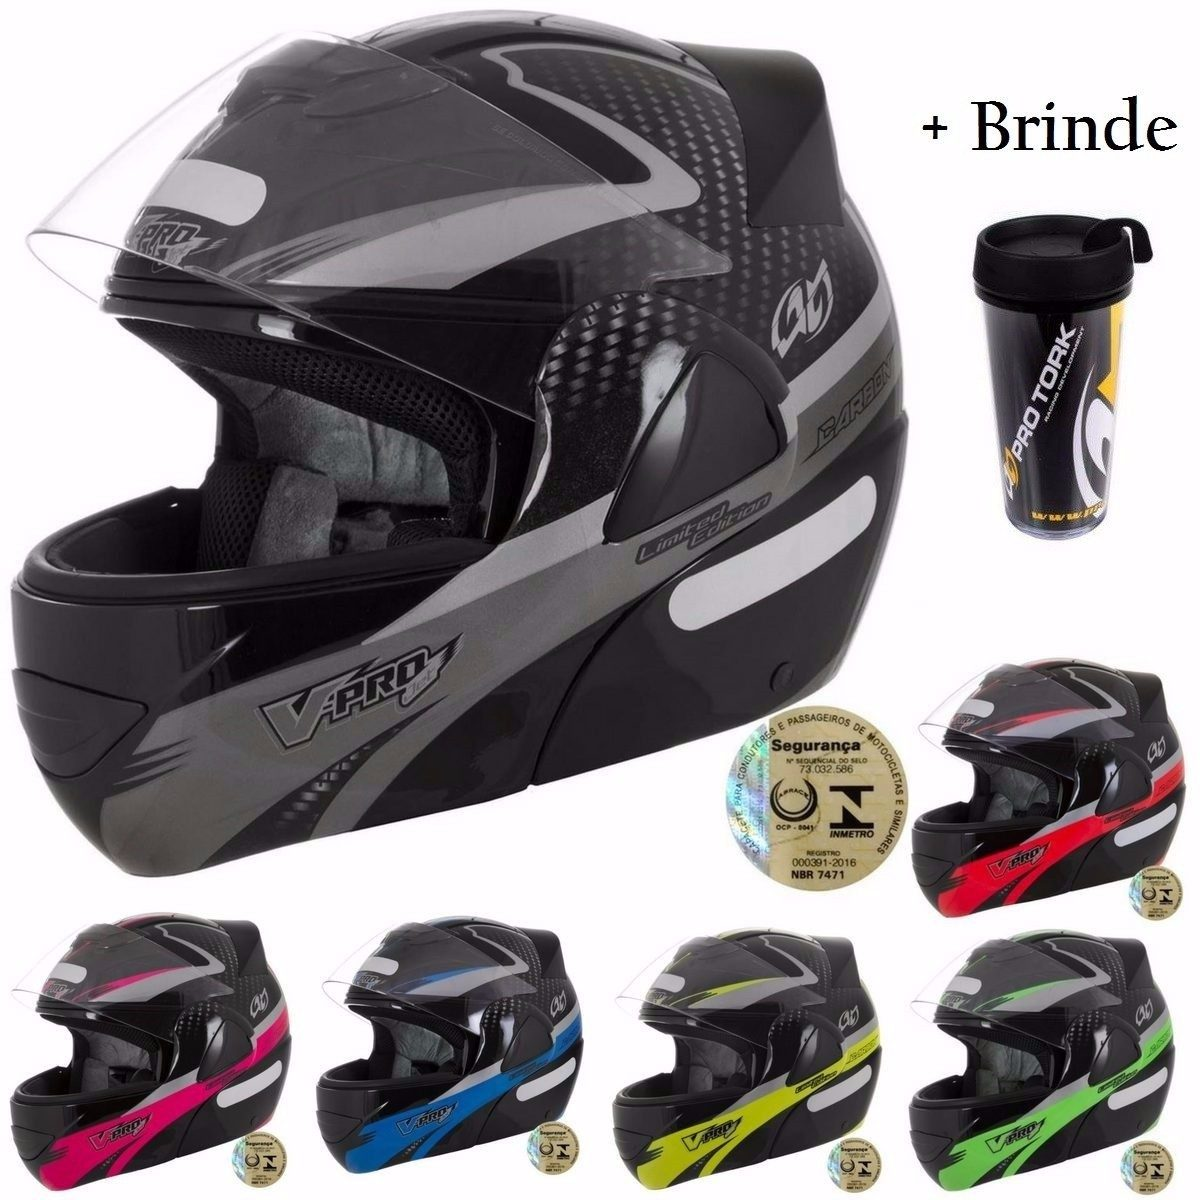 76434c57b capacete escamoteável pro tork v-pro jet 2 carbon rosa girl. Carregando  zoom.